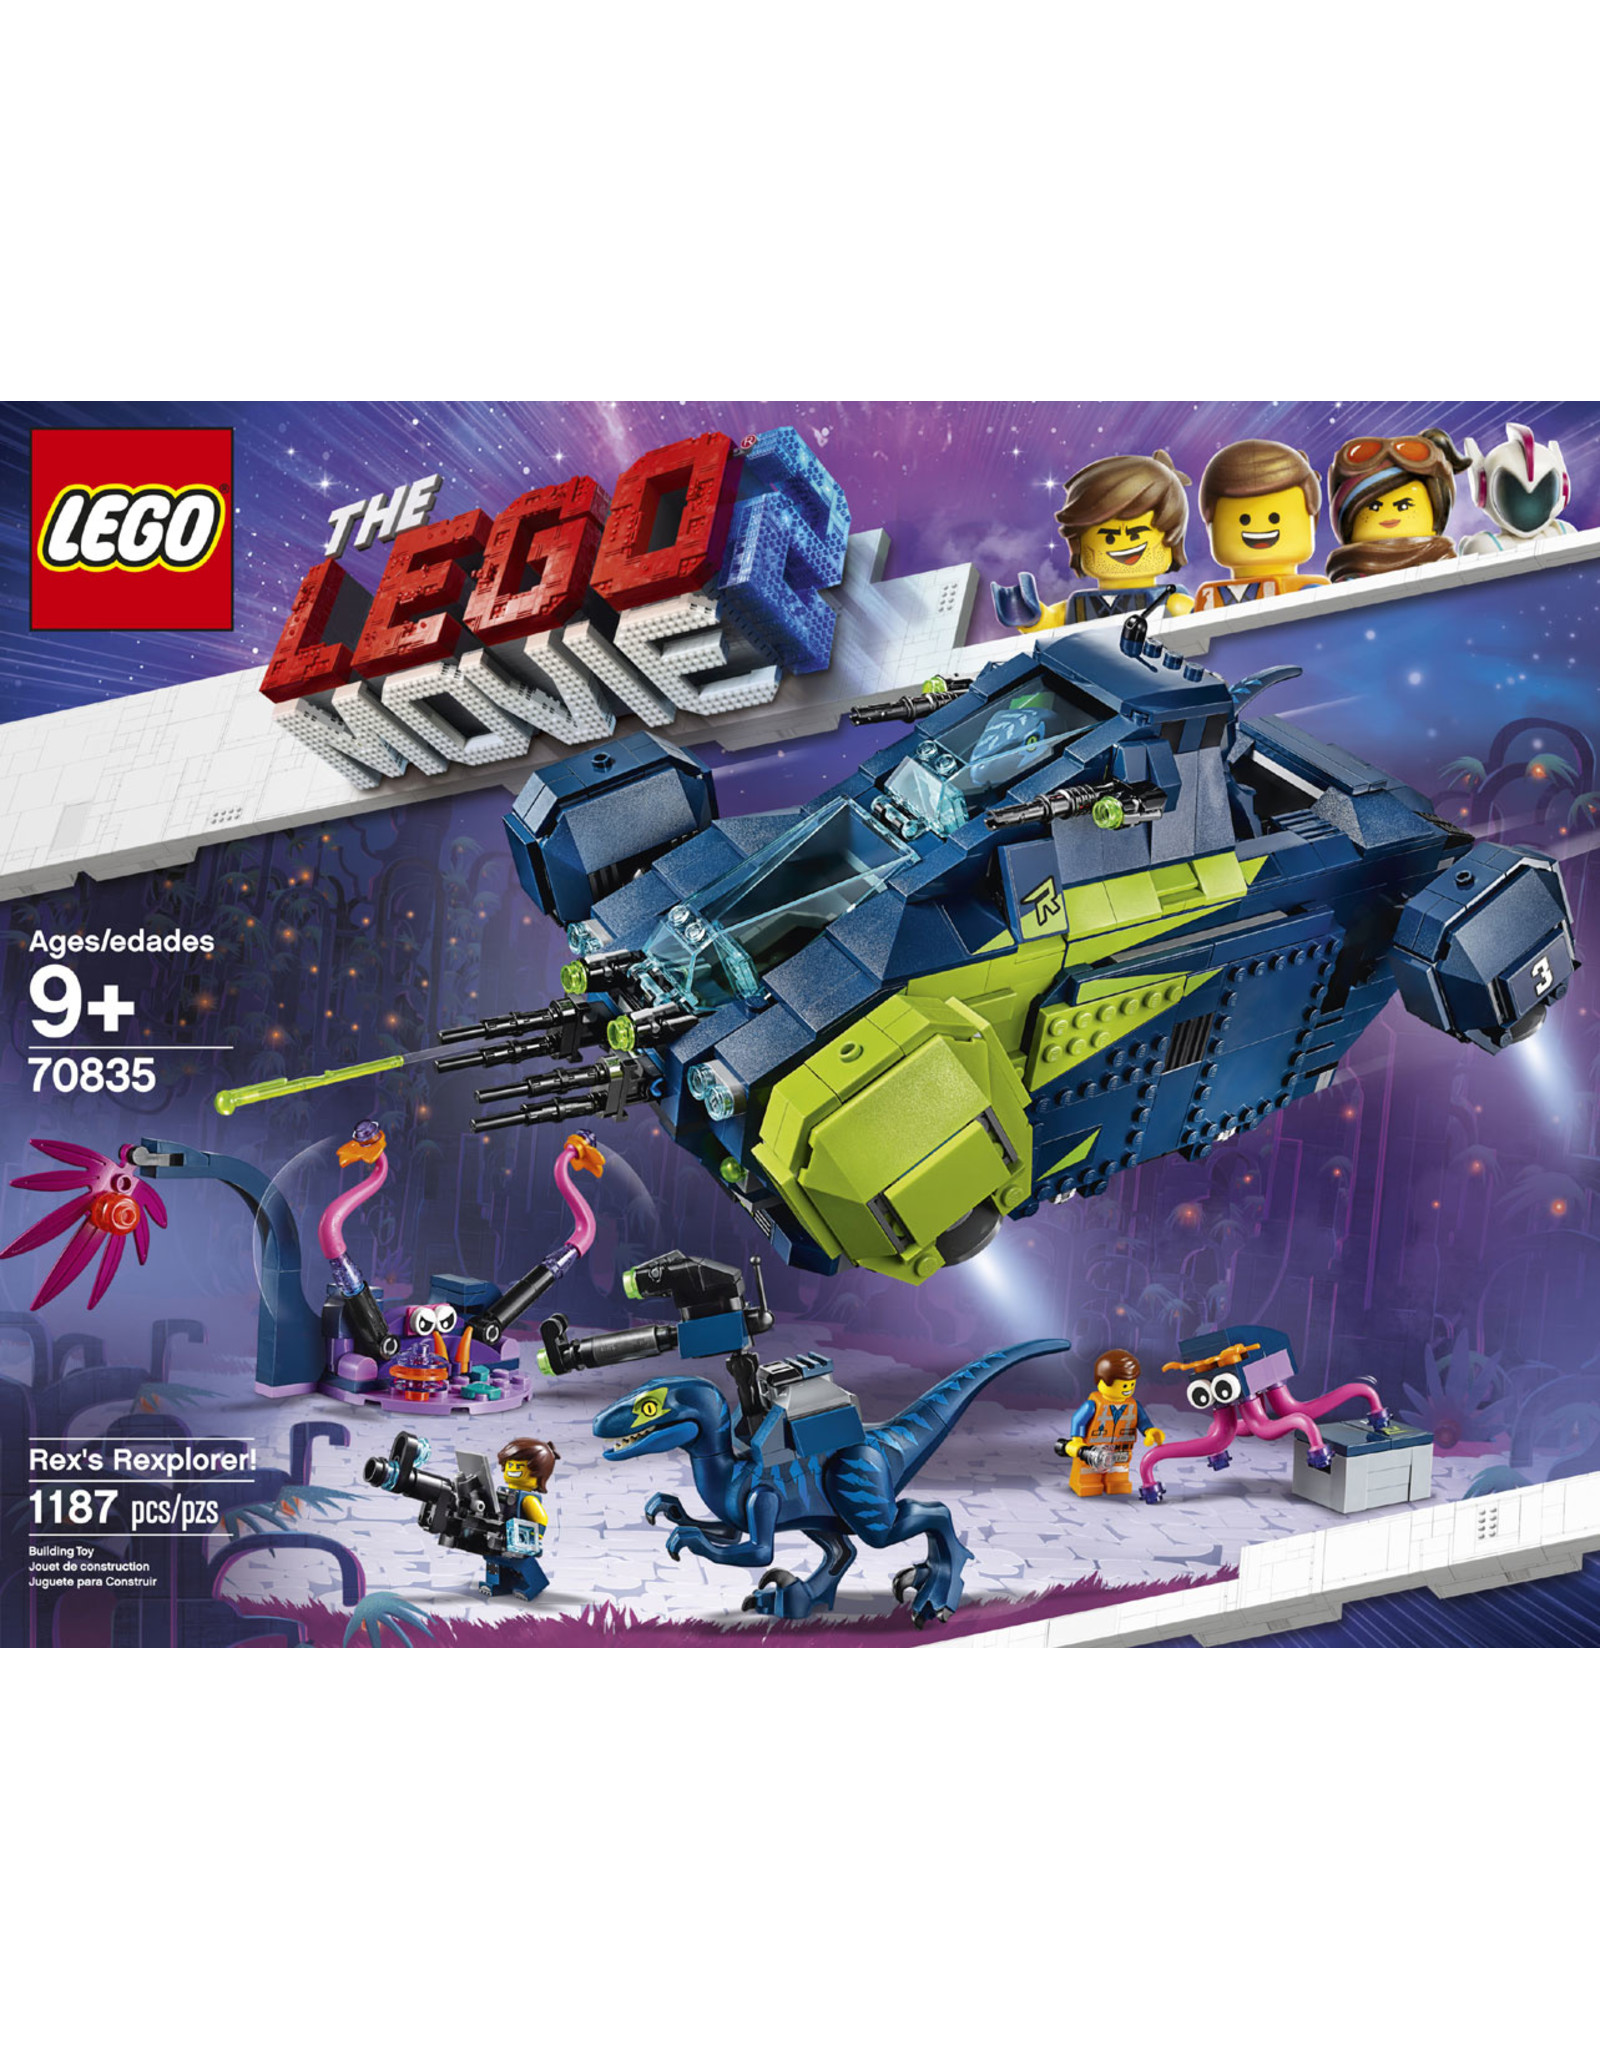 LEGO Lego Movie 70835 Rex's Rexplorer